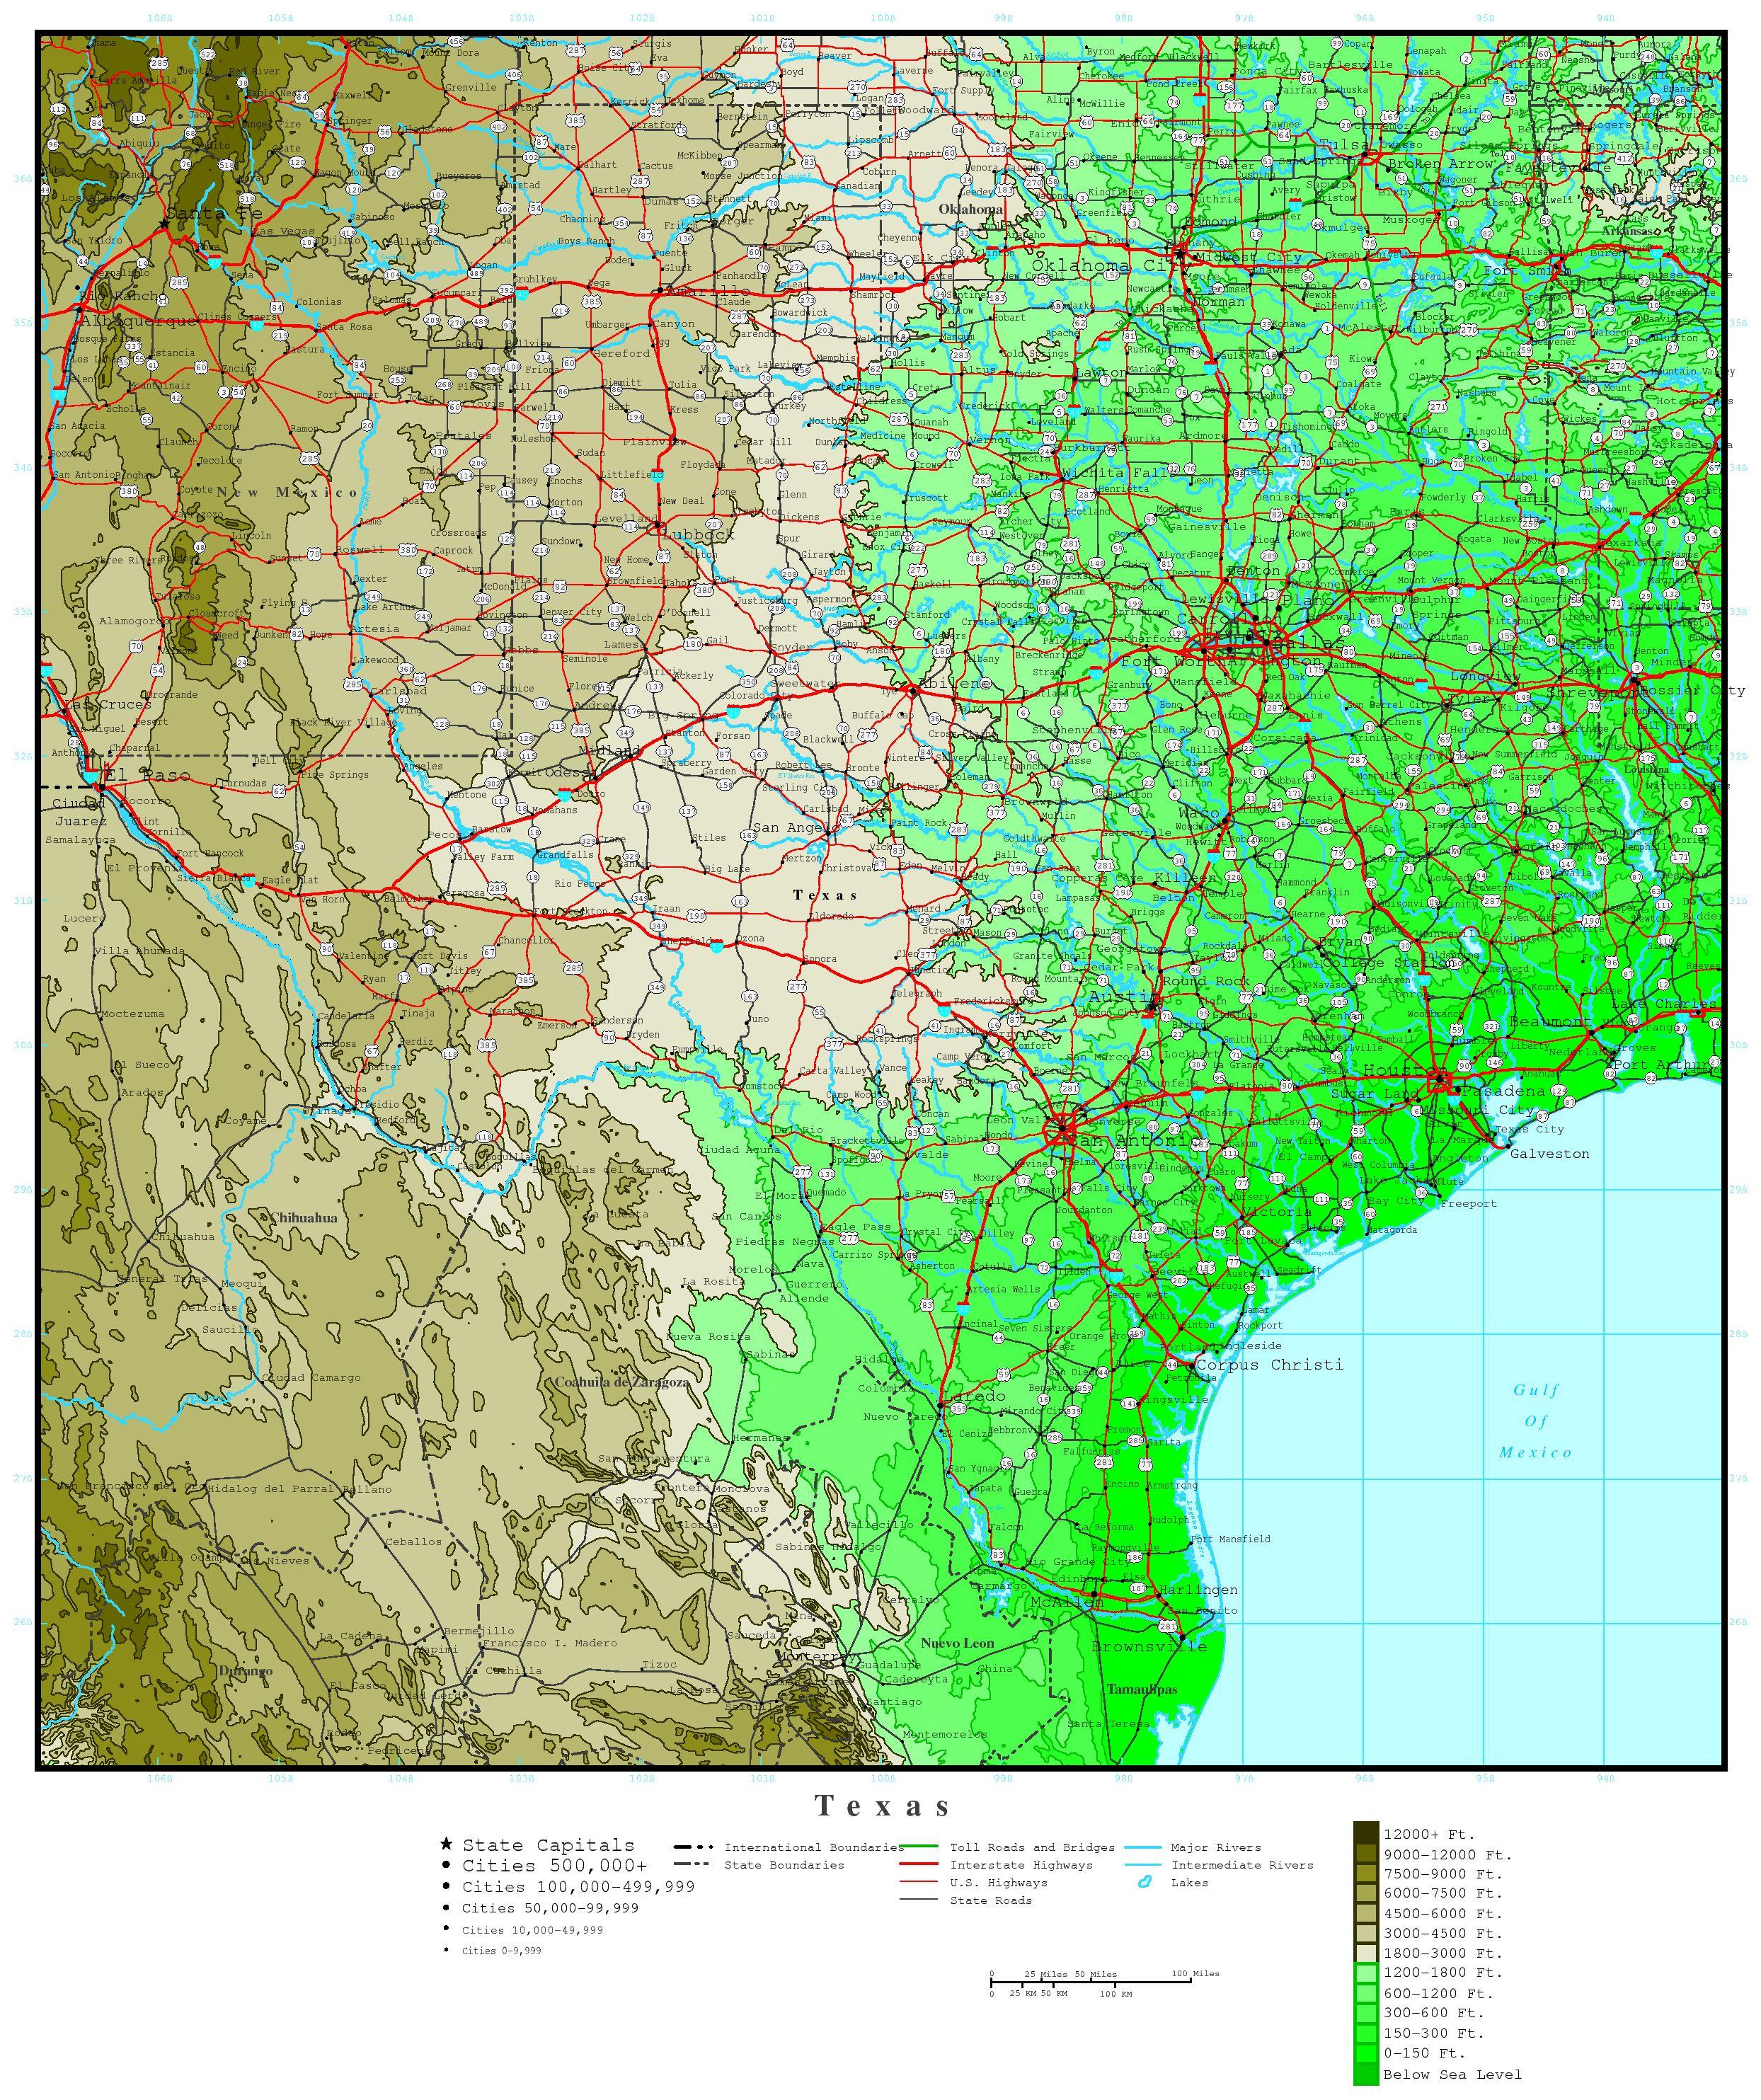 Texas Elevation Map - Florida Elevation Map Free